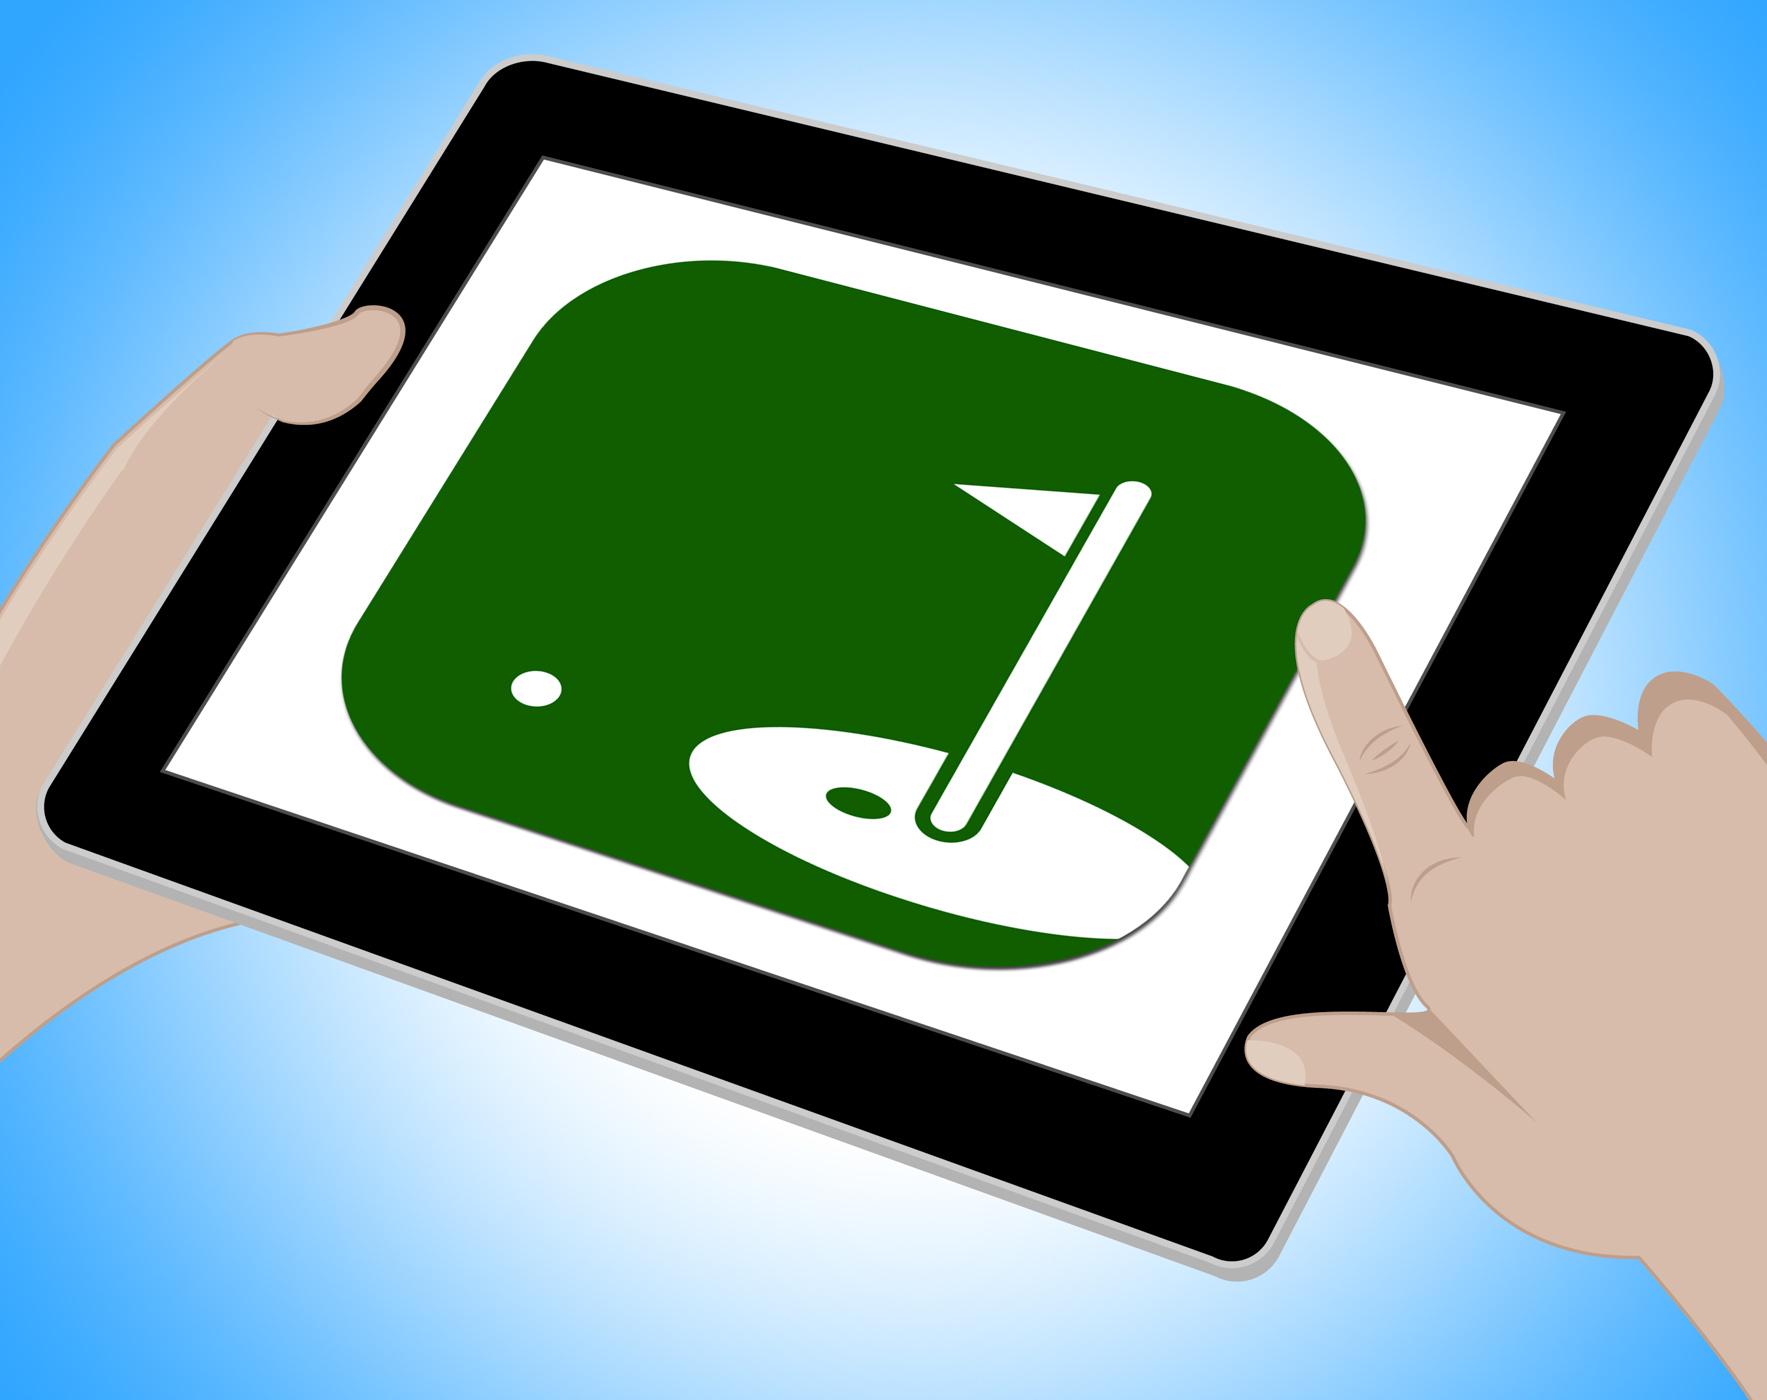 Golf online shows internet golfer 3d illustration photo